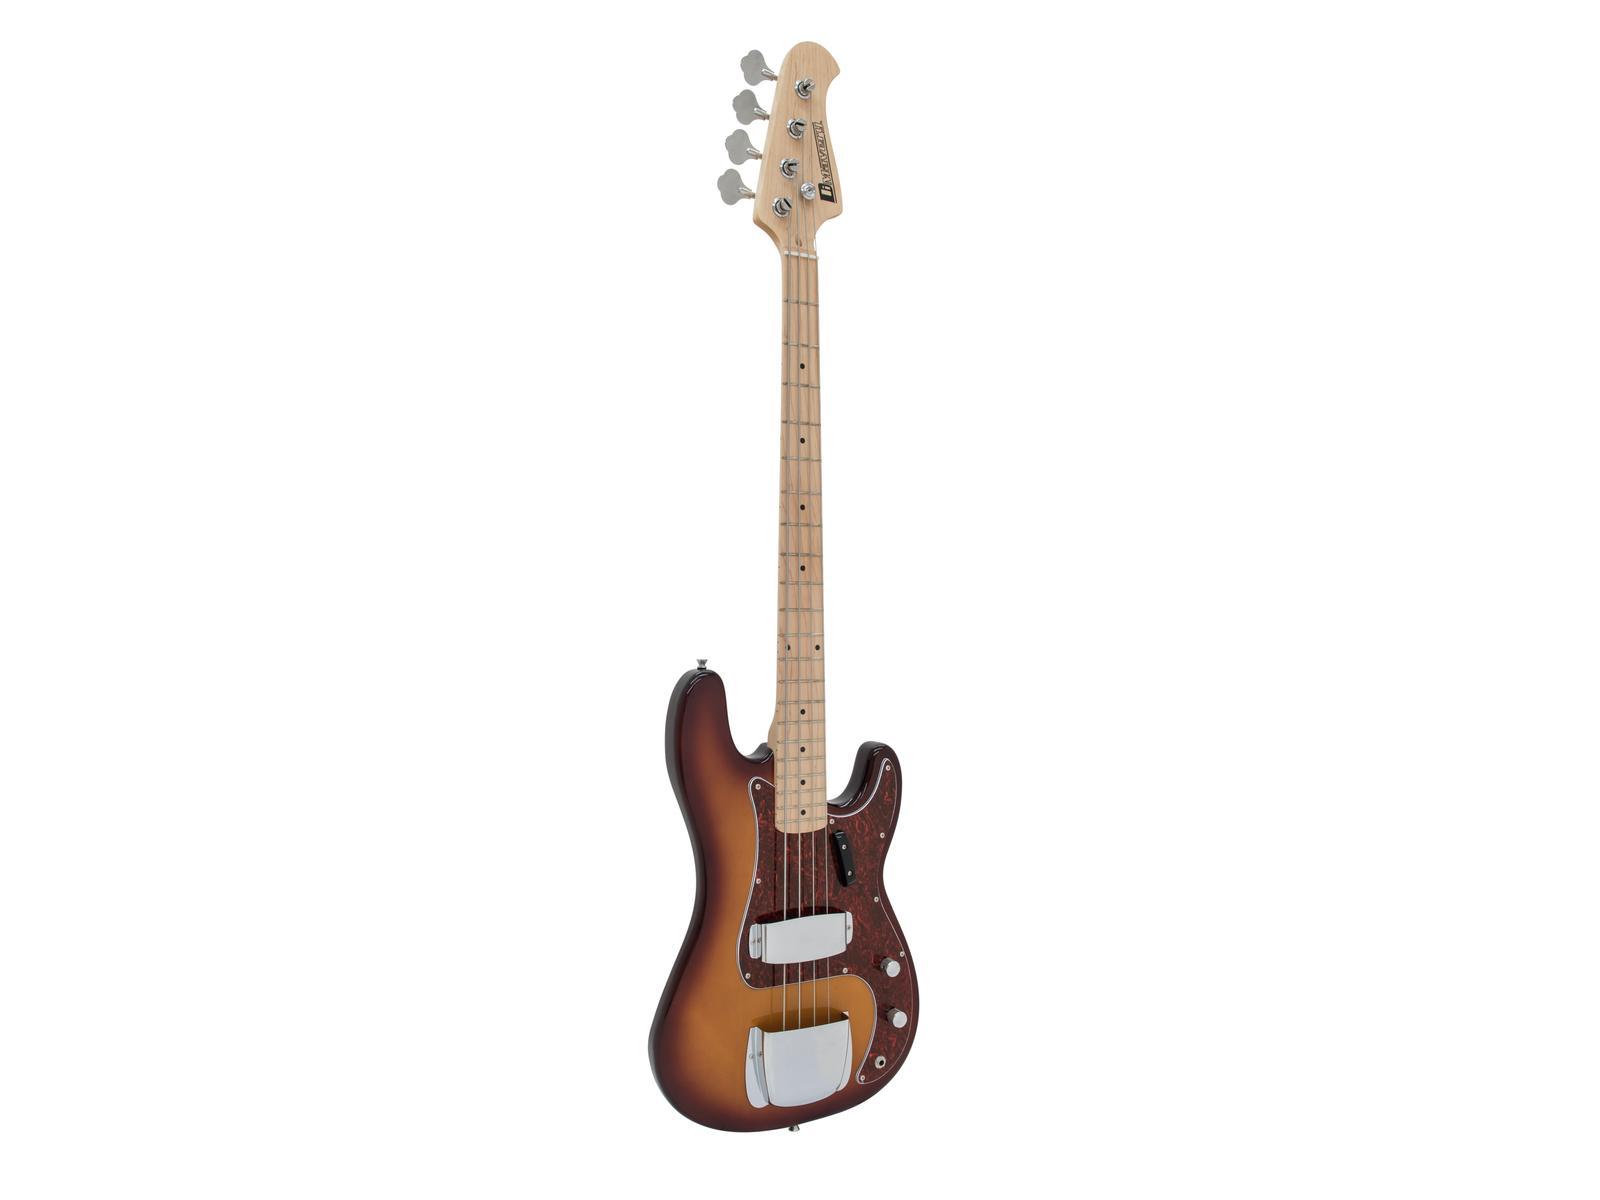 DIMAVERY PB-550A E-Bass, tobaccoburst